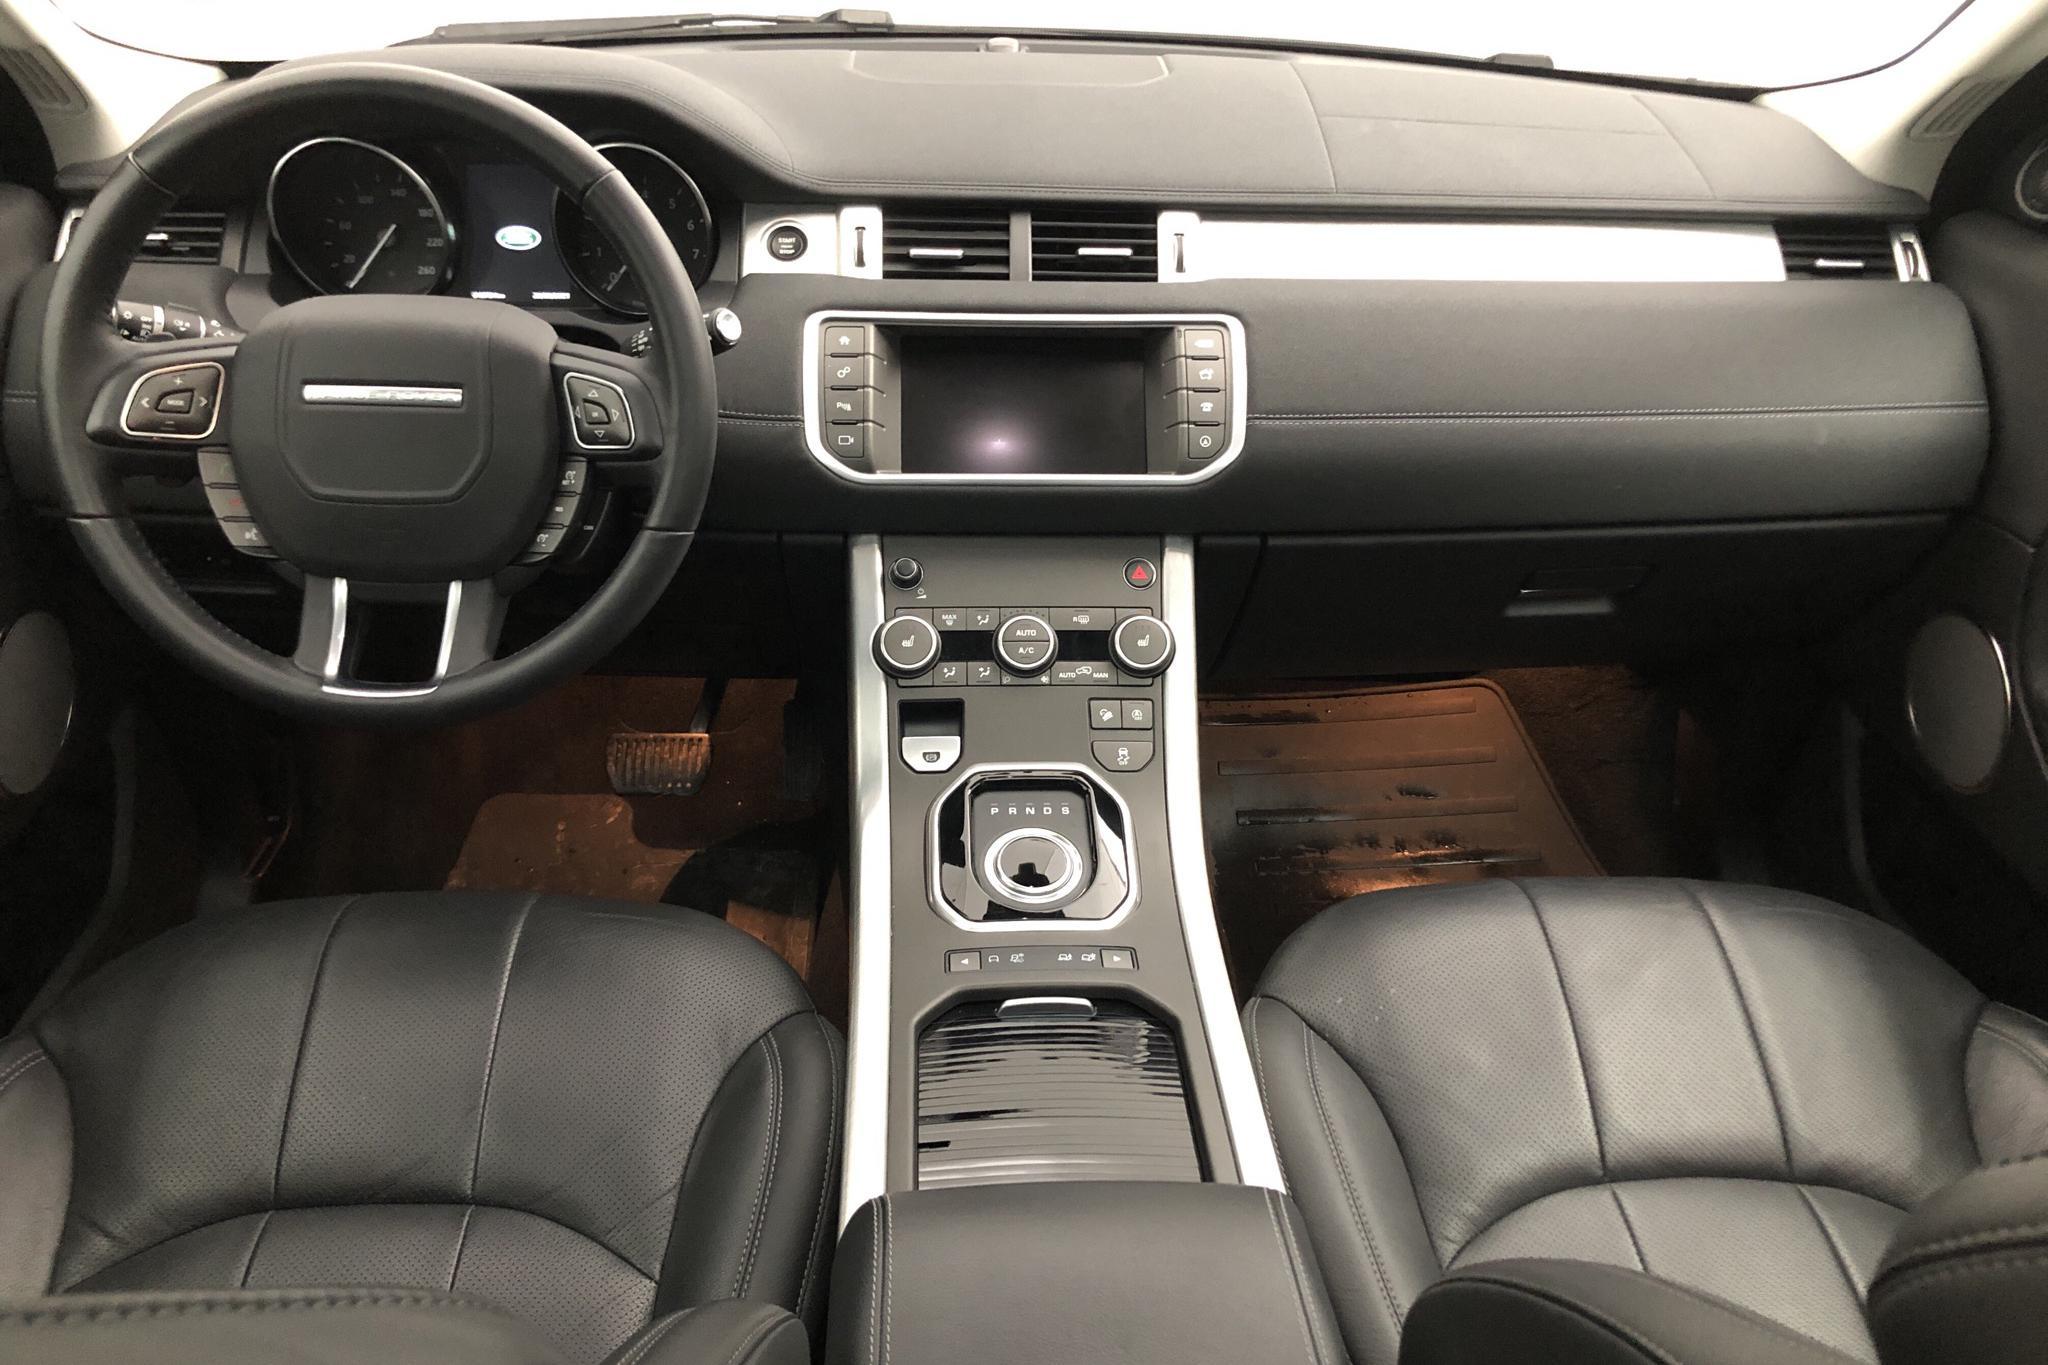 Land Rover Range Rover Evoque 2.0 SI4 AWD 5dr (240hk) - 1 372 mil - Automat - svart - 2018